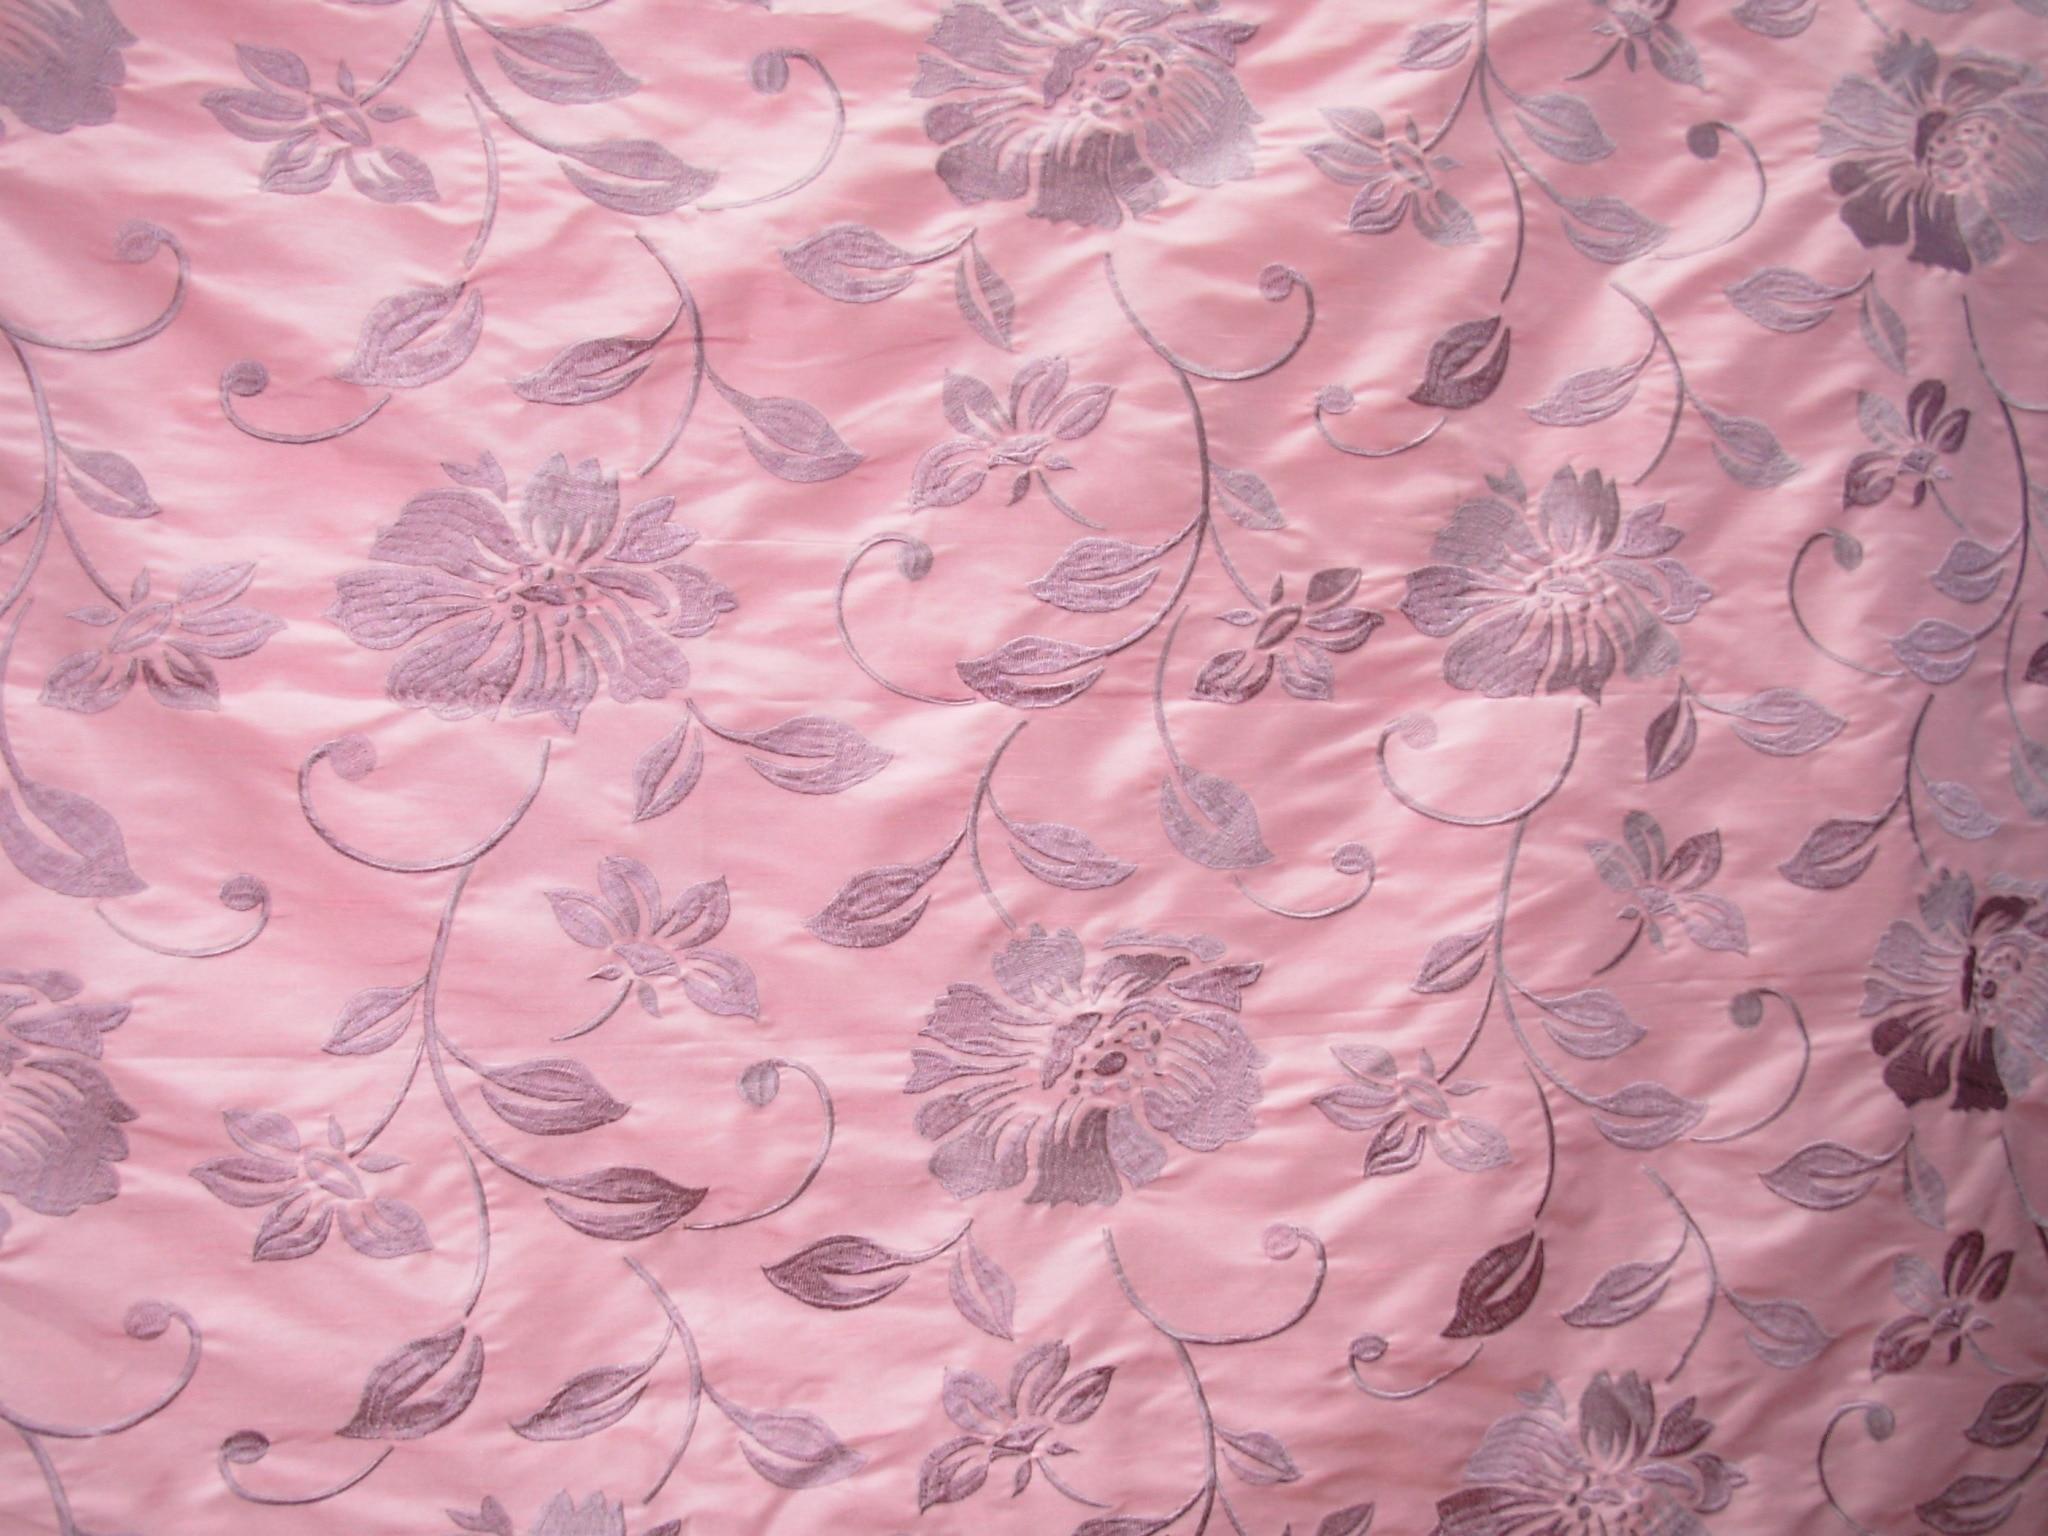 Khoday Silk leading manufacturer and exporters of Printed & embroidery silk fabrics in Bangalore, India  visit: www.khodaywilliams.com/www.khodaysilk.com